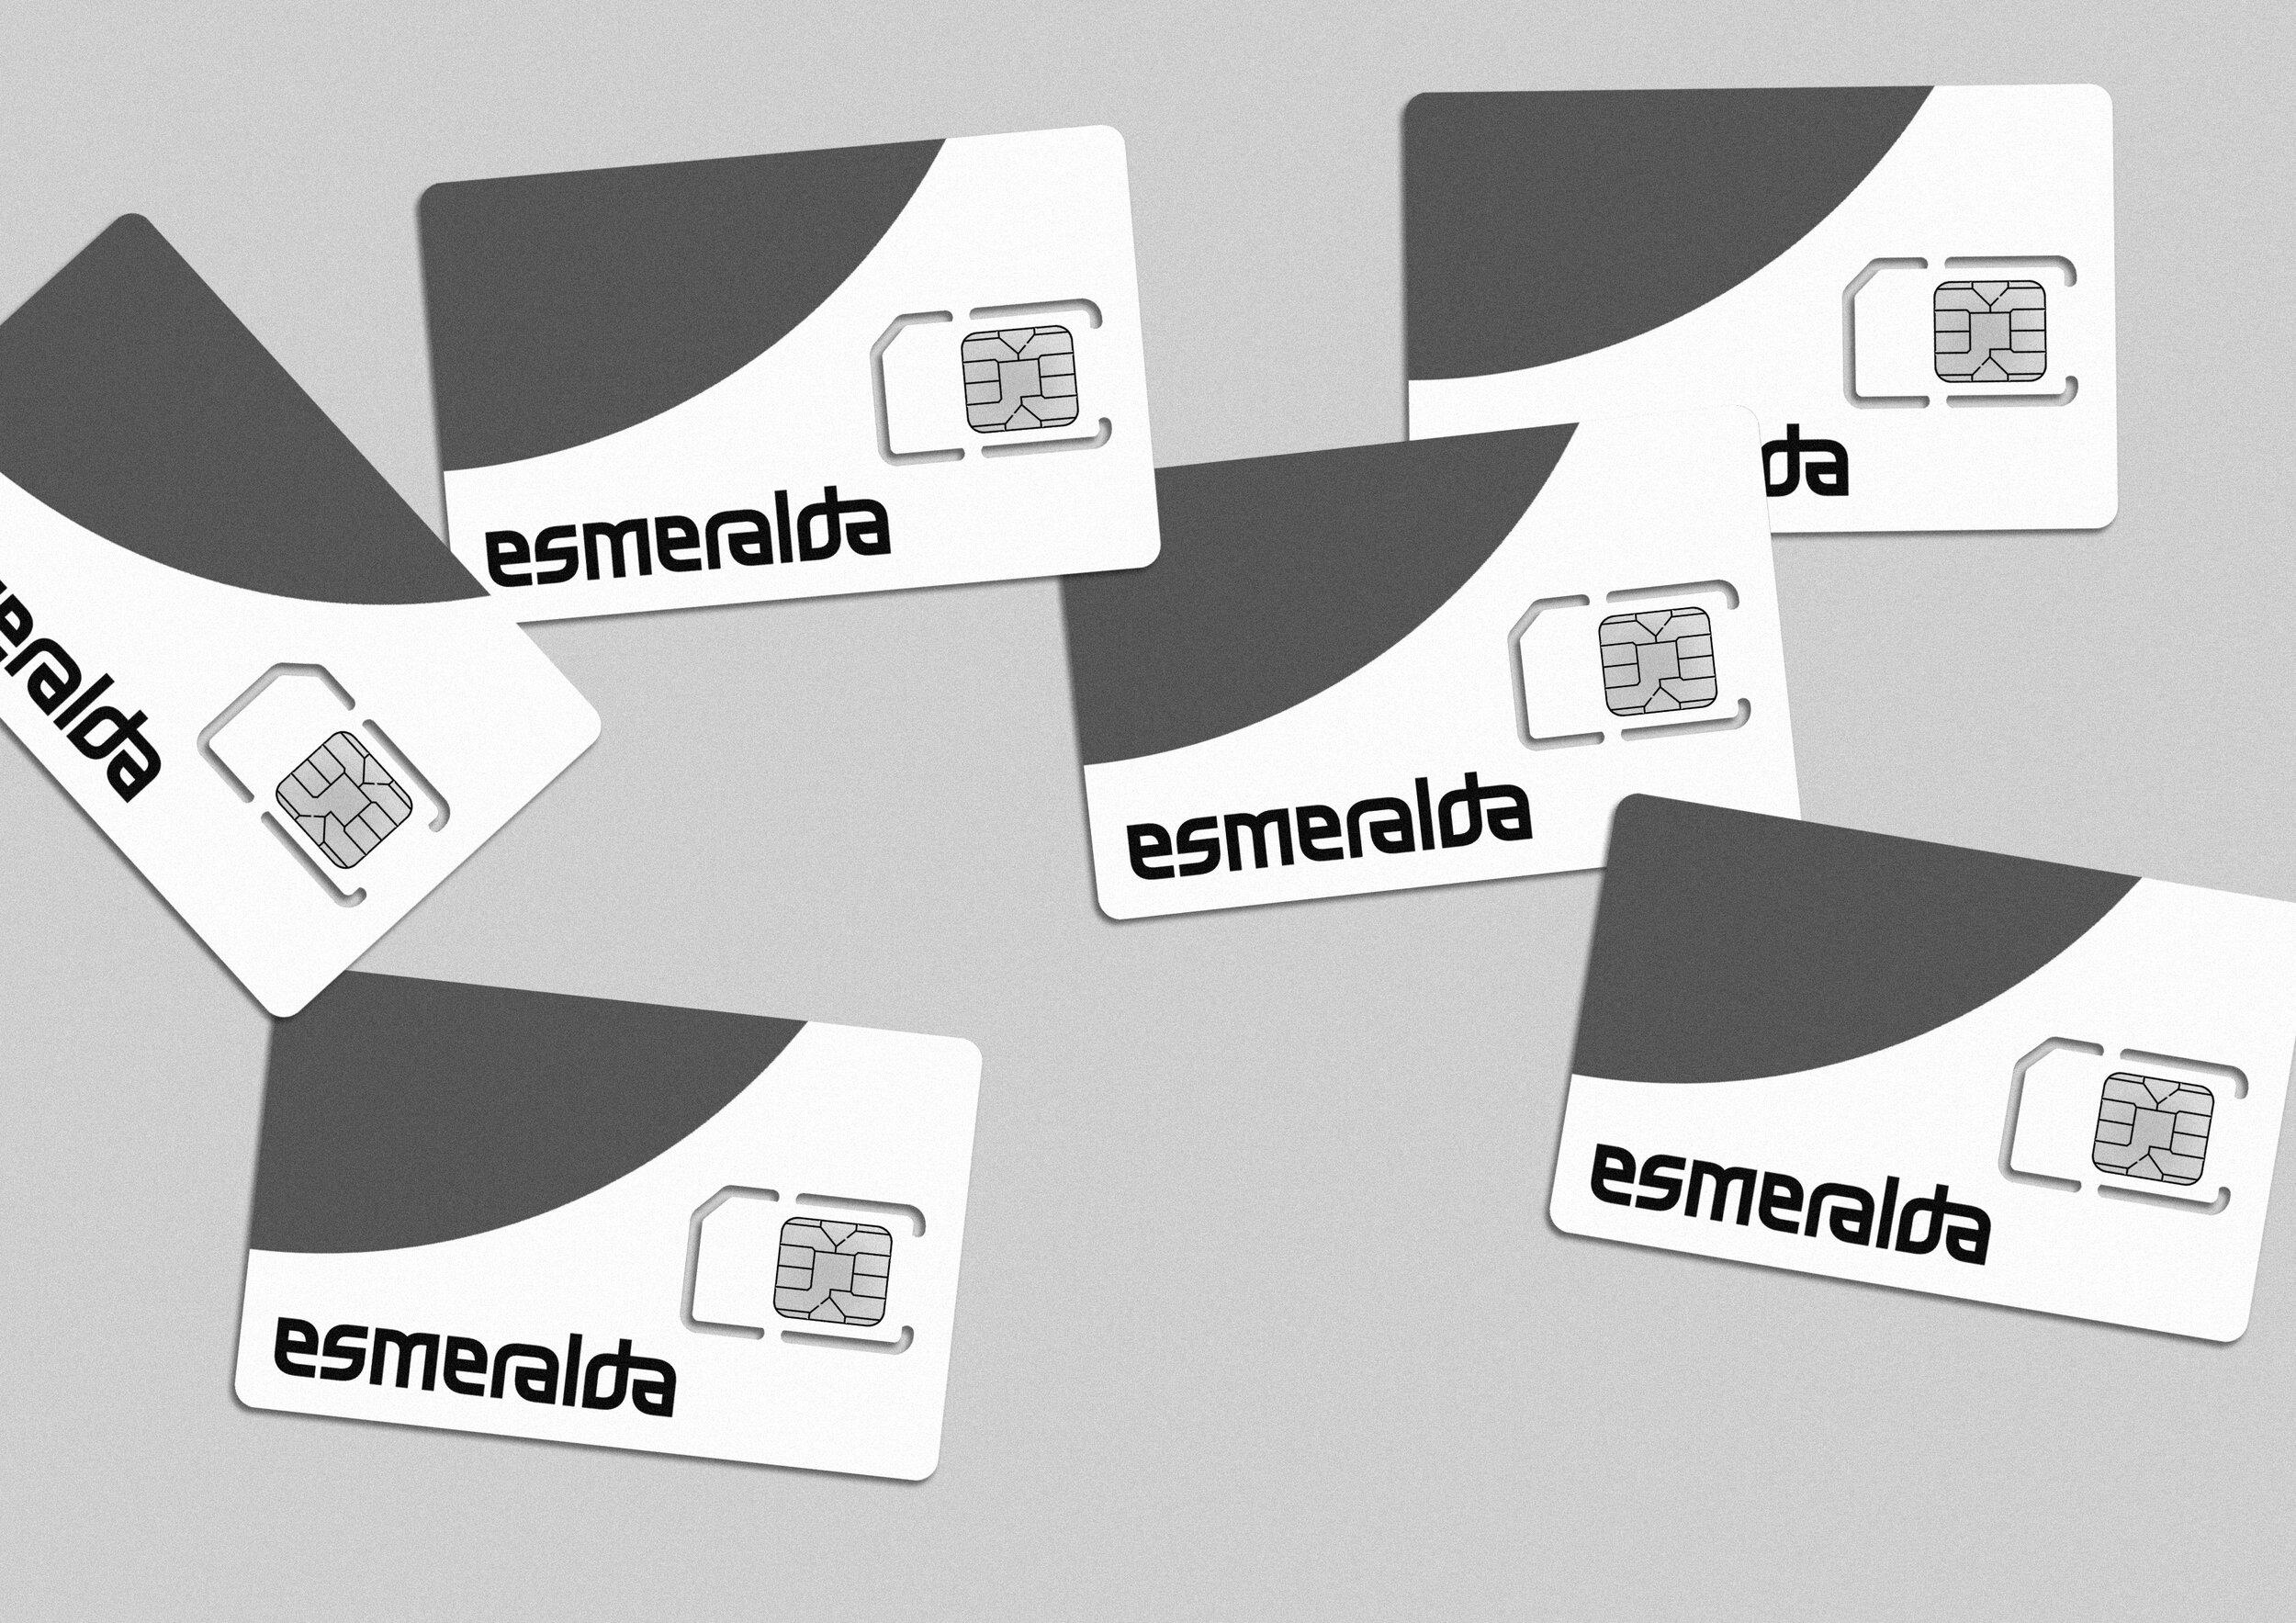 esmeraldatdcbw-2.jpg